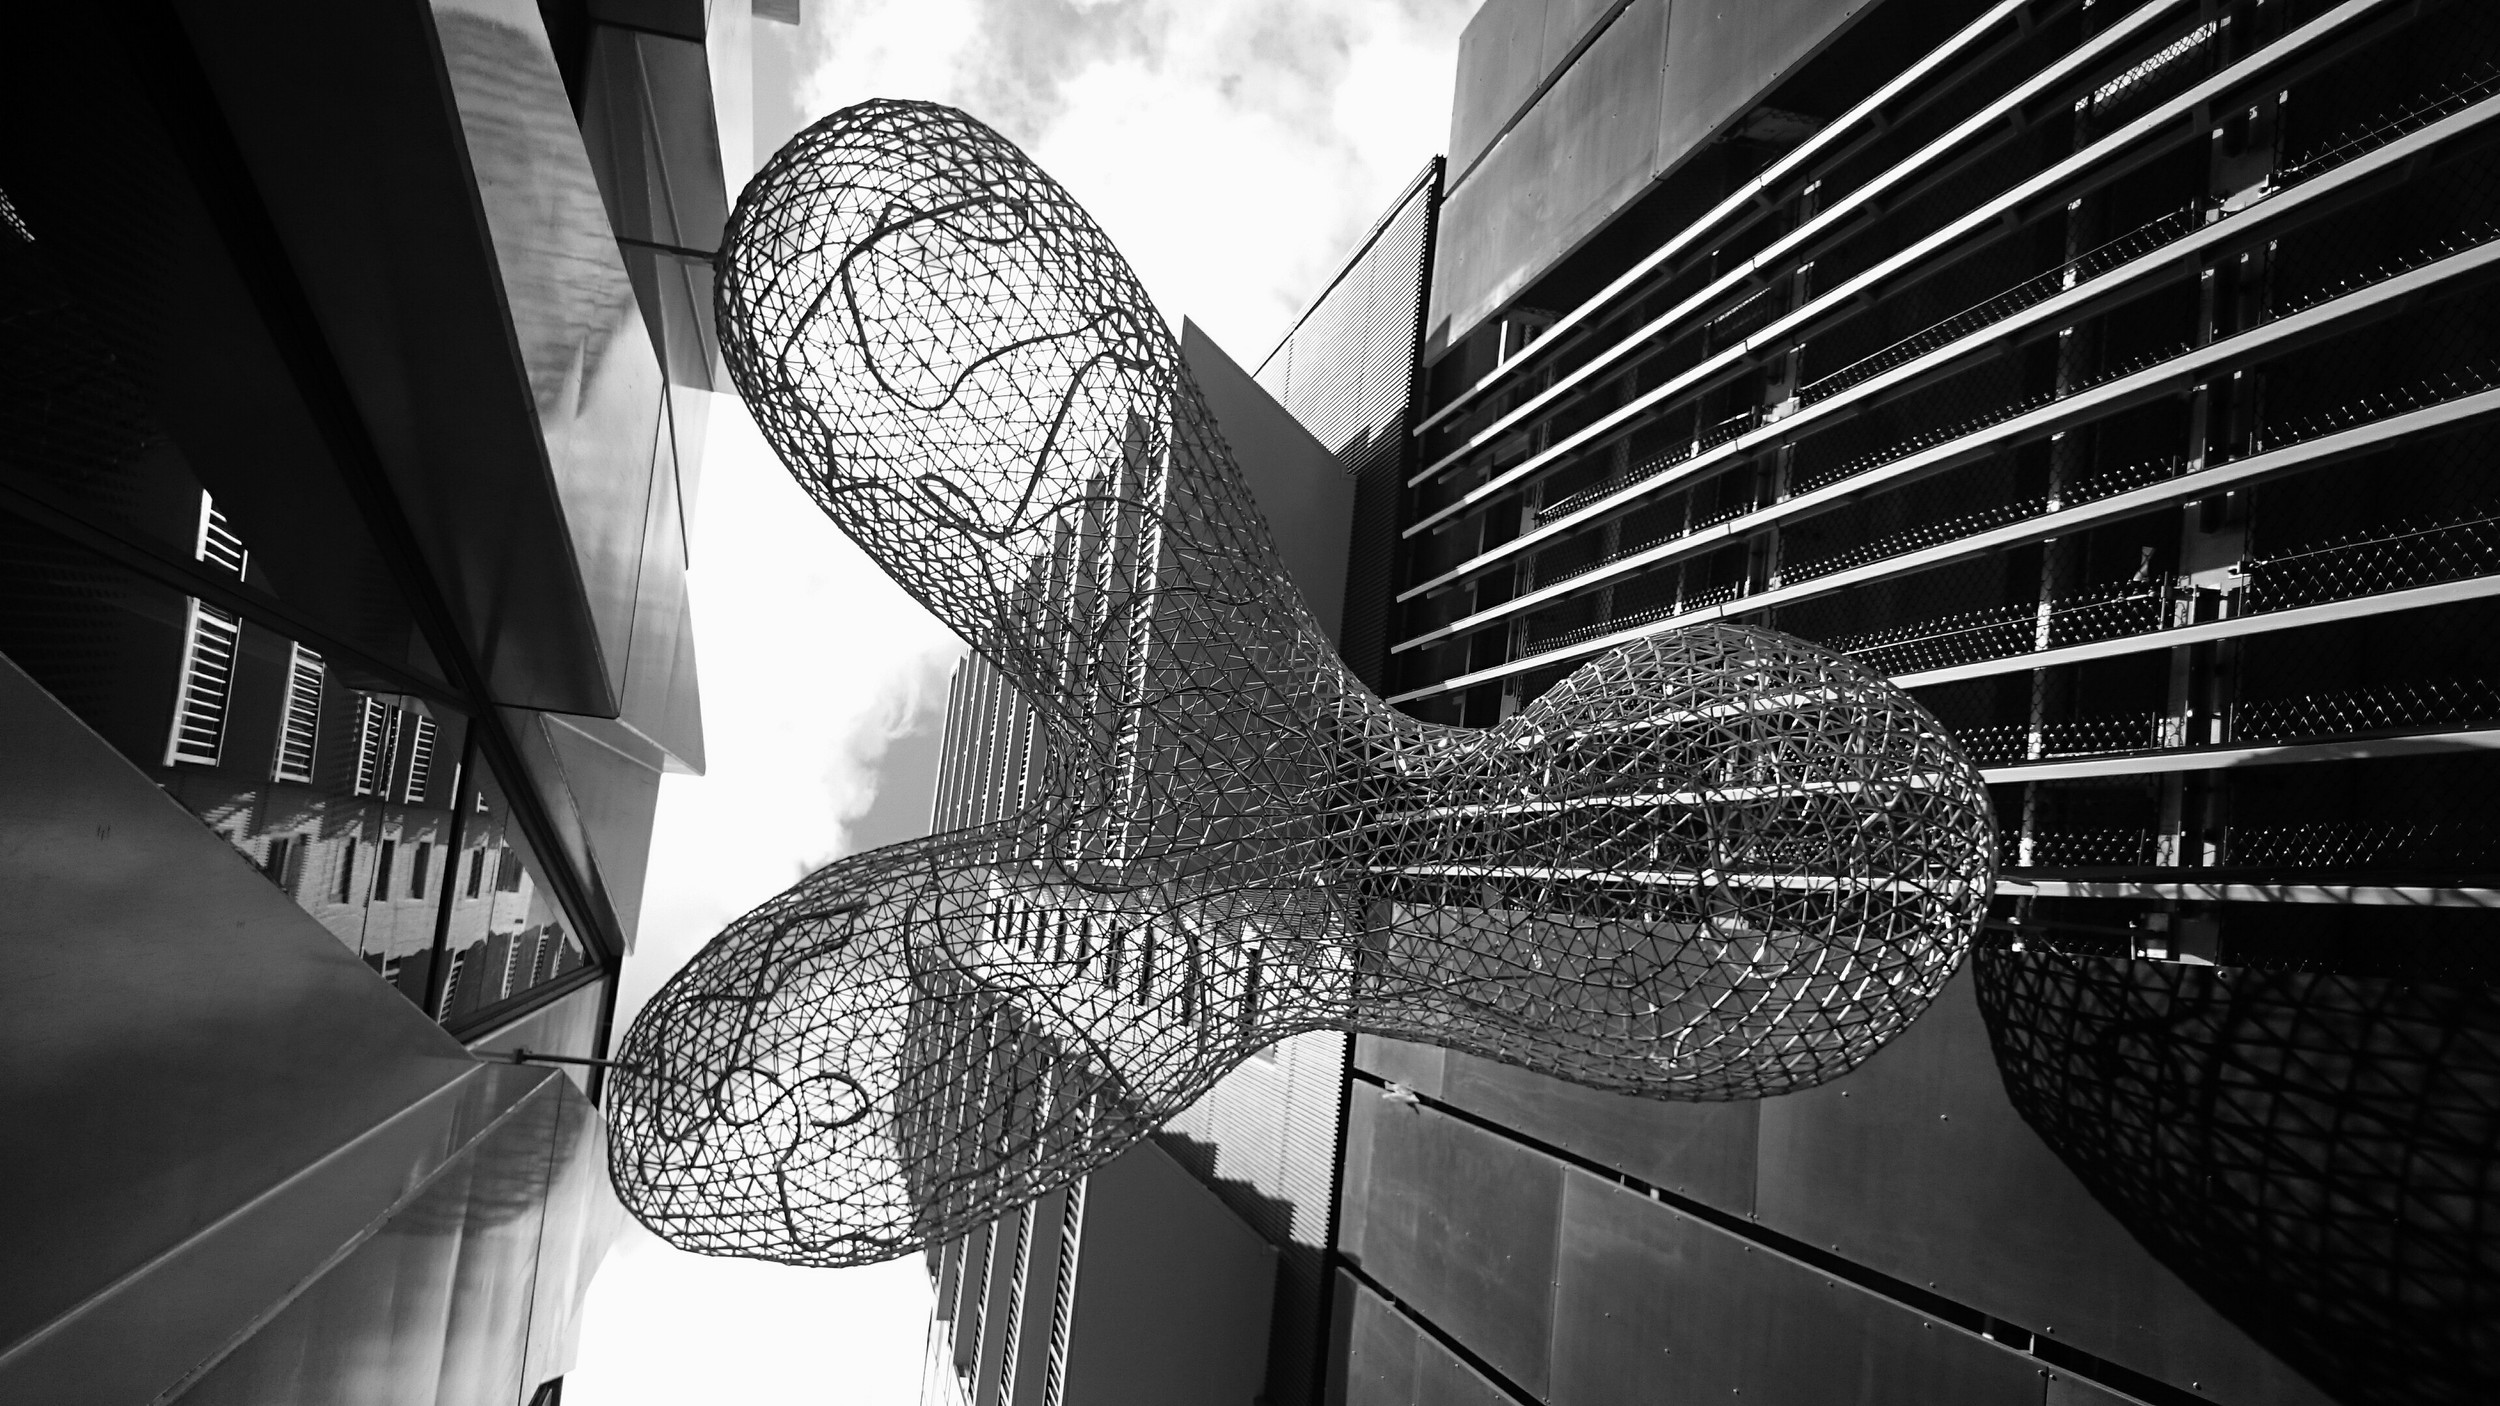 Transit Cloud  2015 Collaboration: S  ara Hughes & Gregor Kregar  Public Art Project commissioned by Auckland Council.